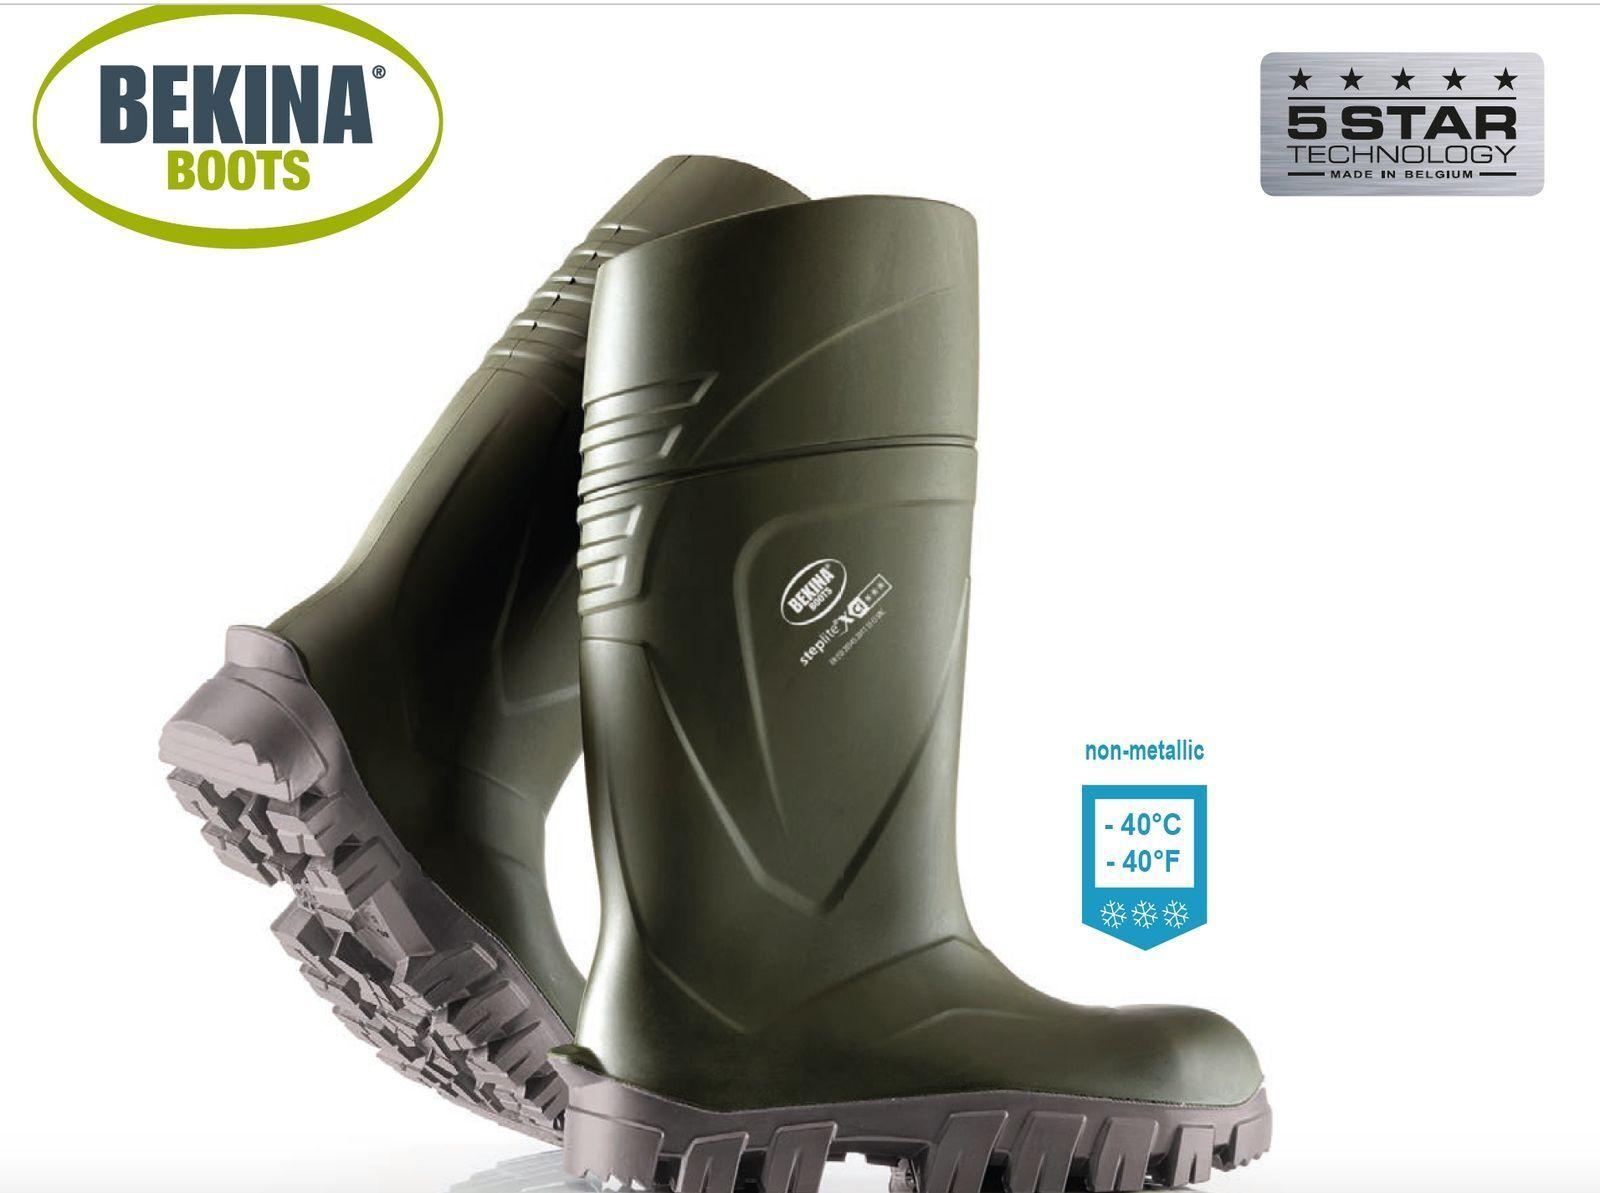 NUOVO Bekina steplite ® XCI S5 (sicurezza -40 ° C/F) Thermo Stivali Di Gomma Stivali Wellington Welly